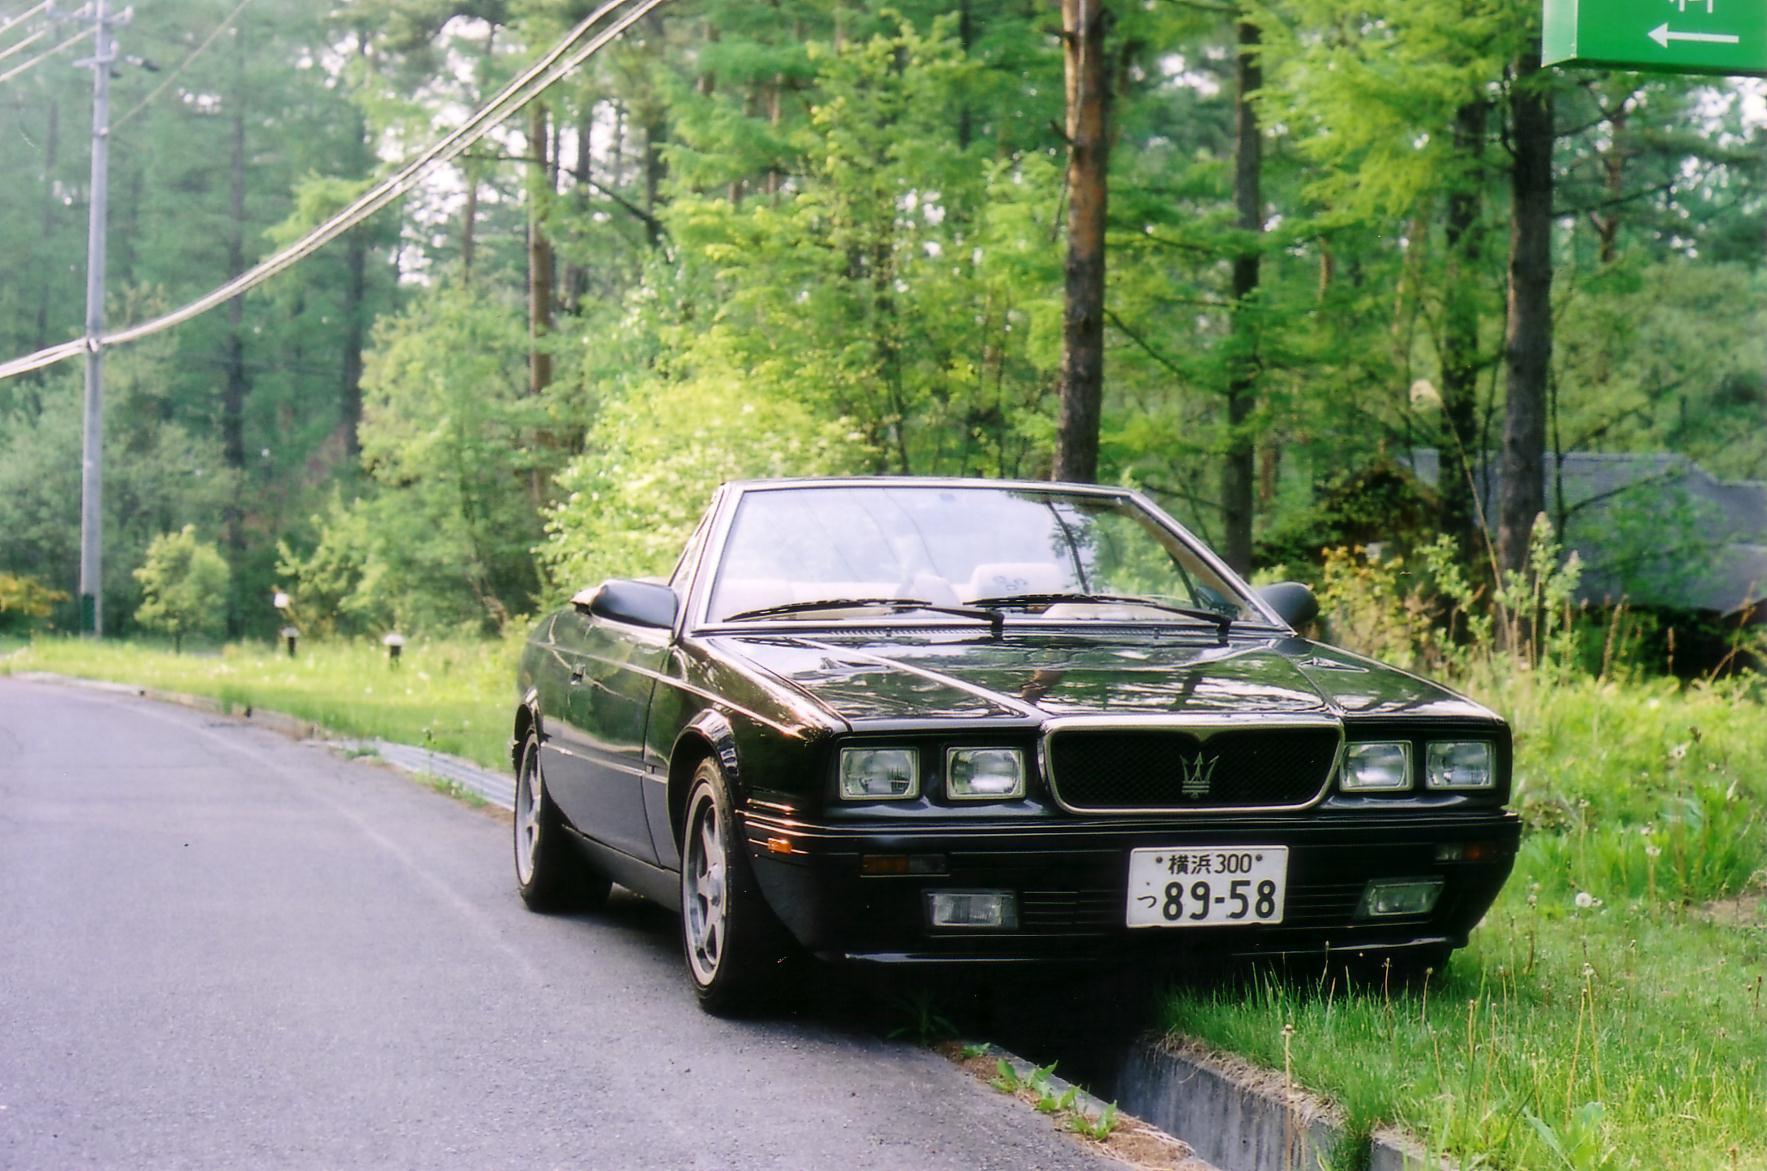 http://zagatoclub.jp/cars/maserati.JPG